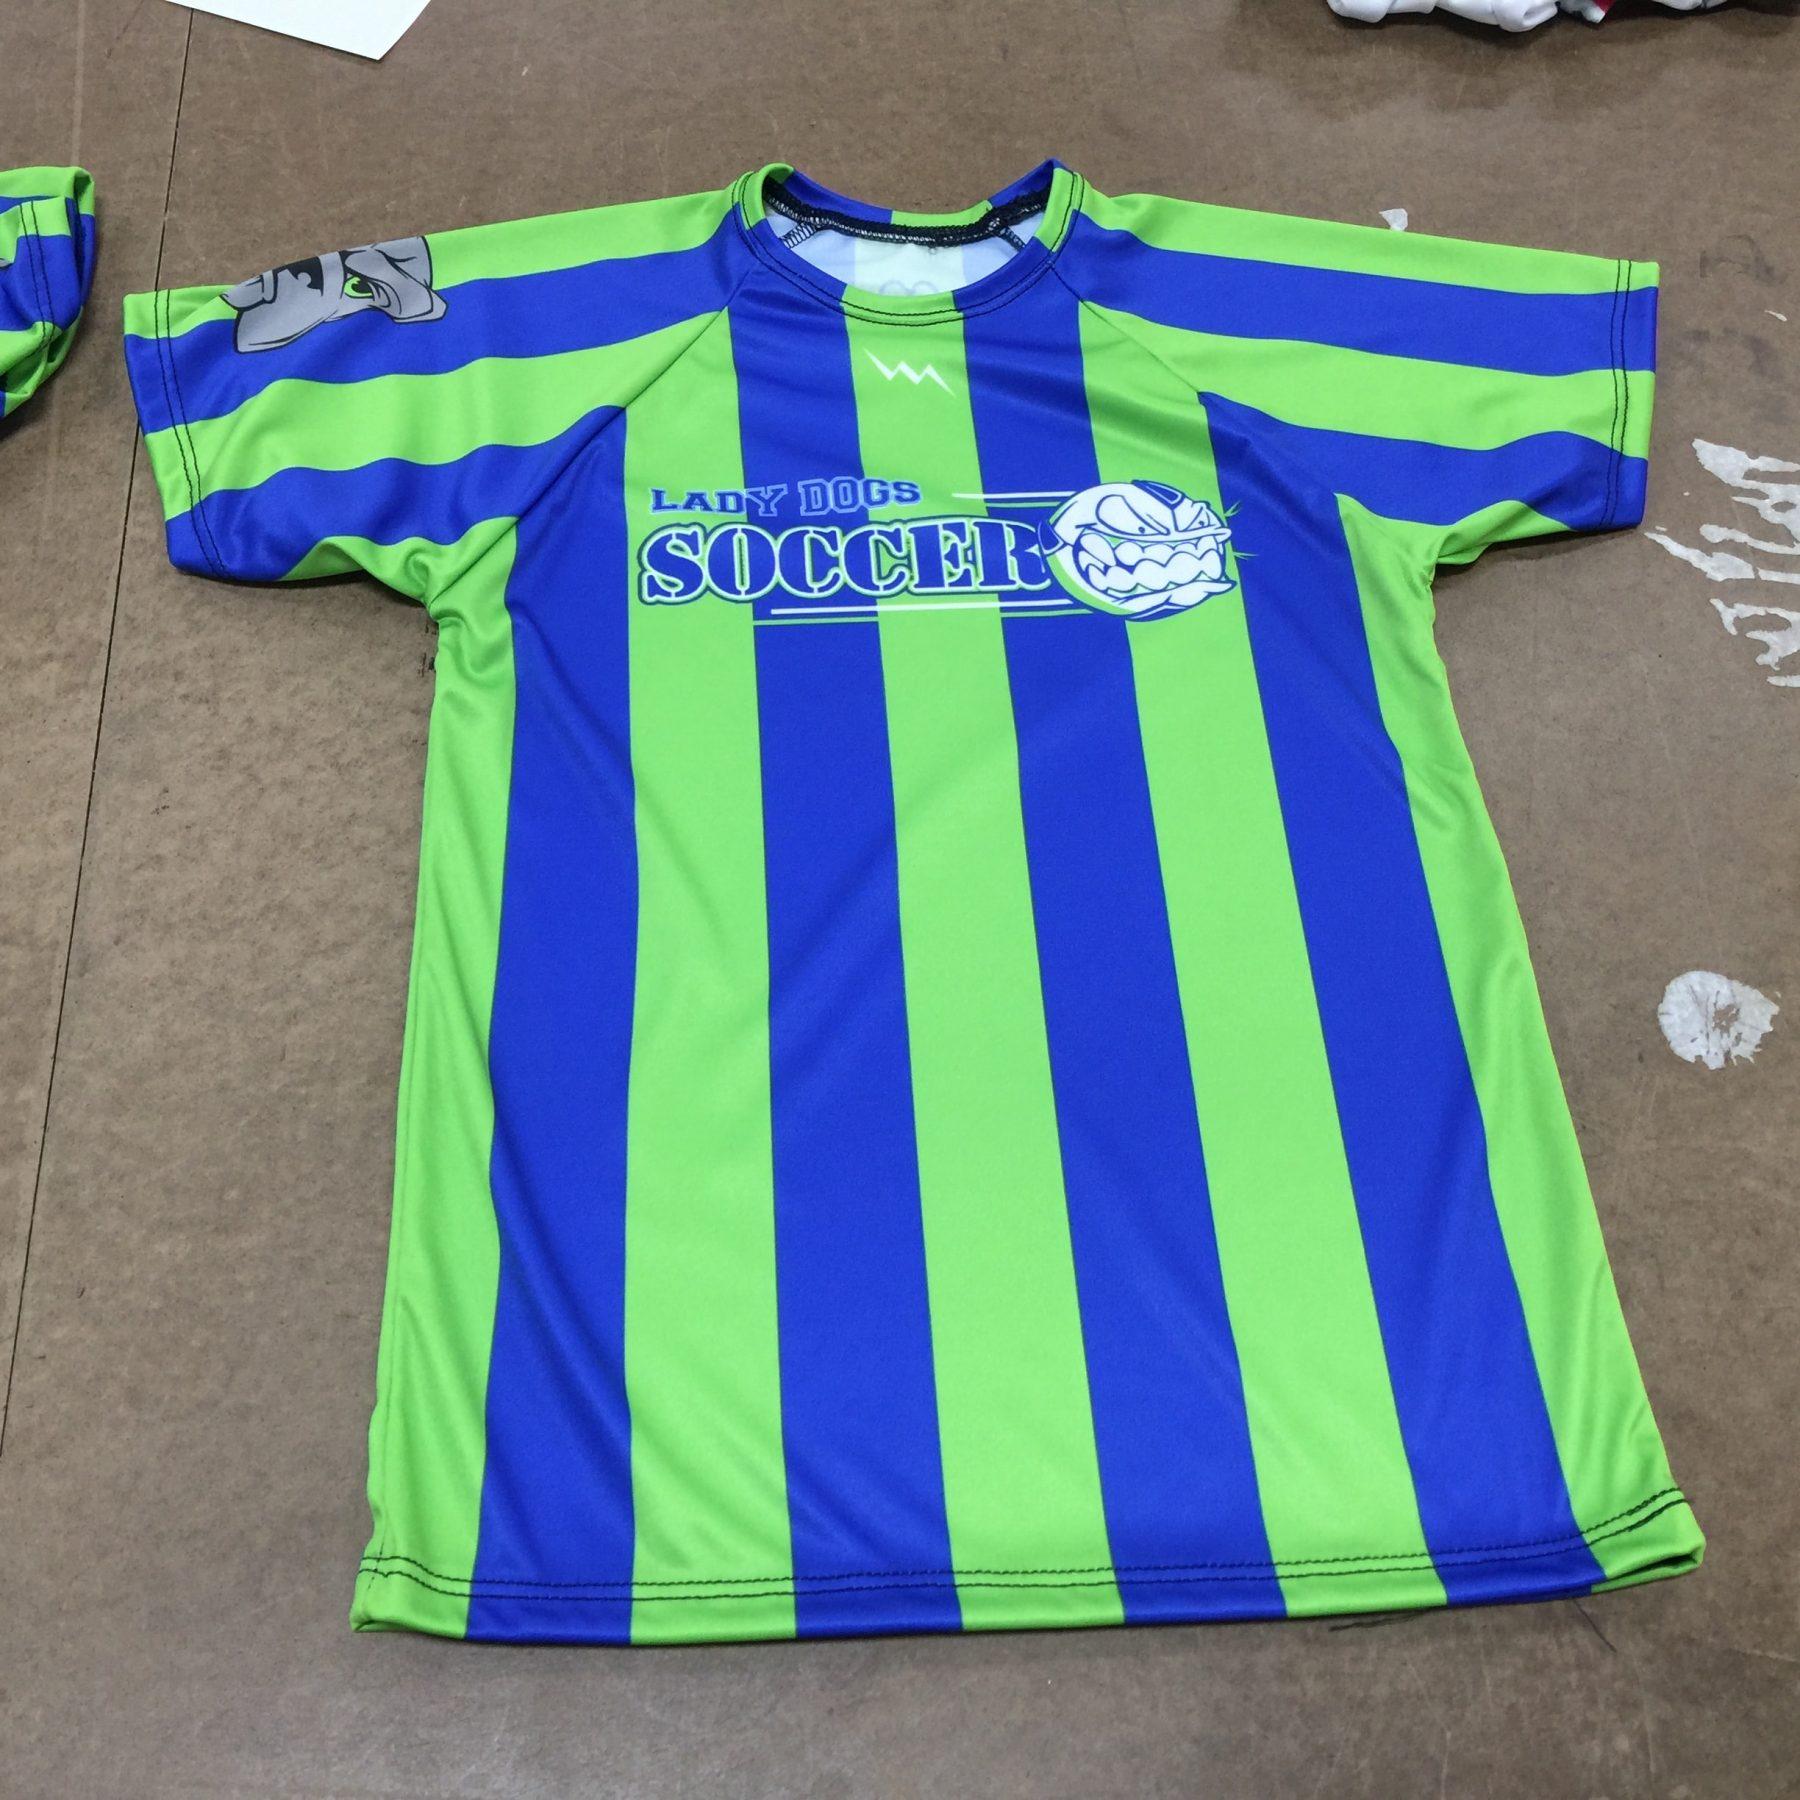 buy popular 65ccc d14e4 Kids Soccer Uniforms - Pinnies - Shorts - Reversible Jerseys